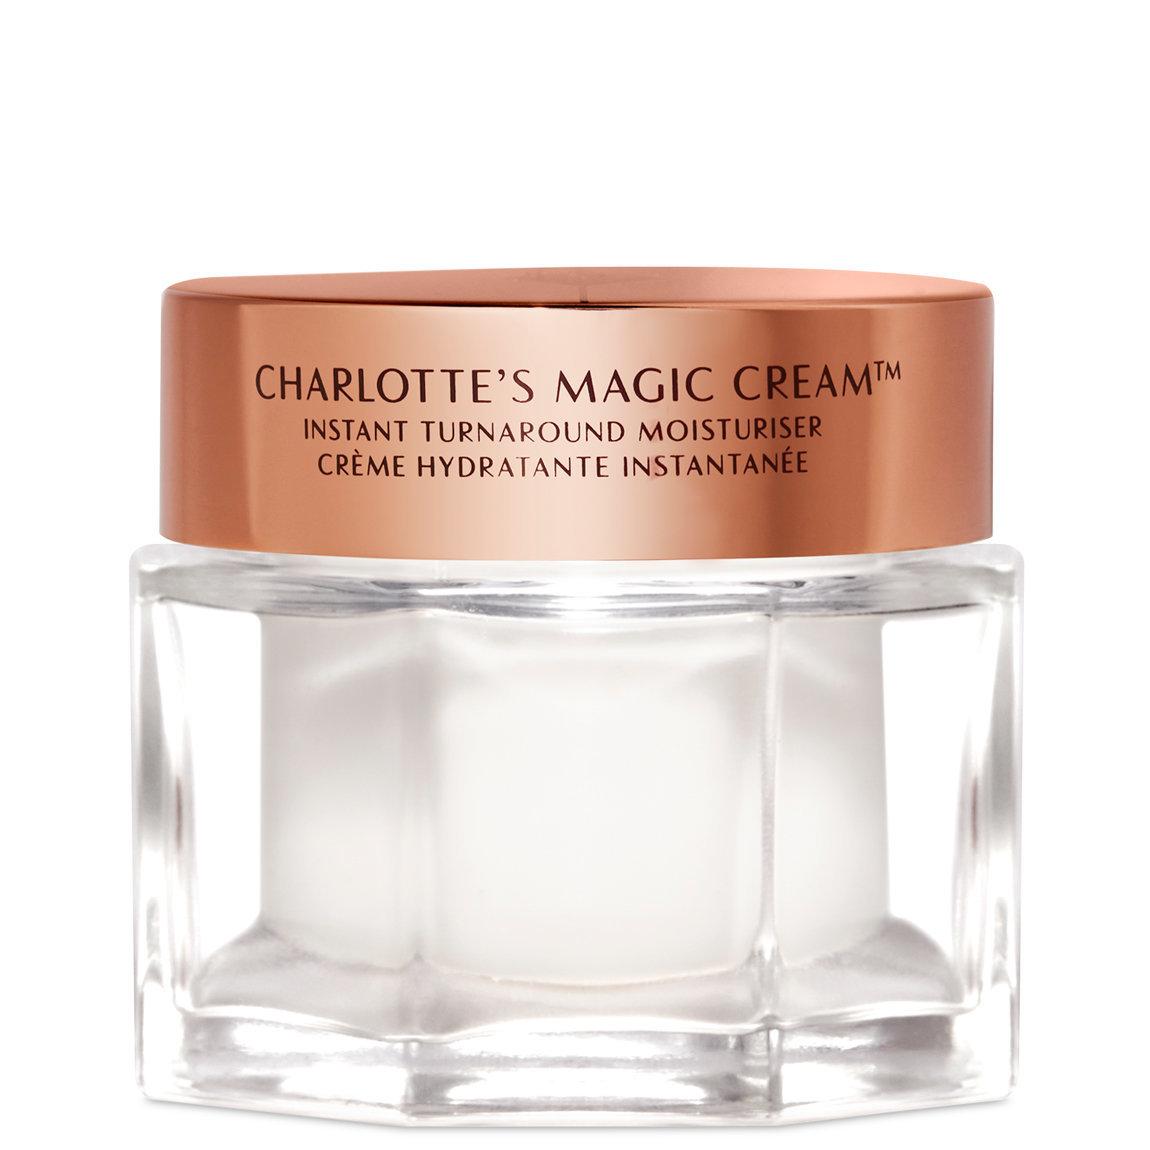 Charlotte Tilbury Charlotte's Magic Cream 50 ml Refillable alternative view 1 - product swatch.